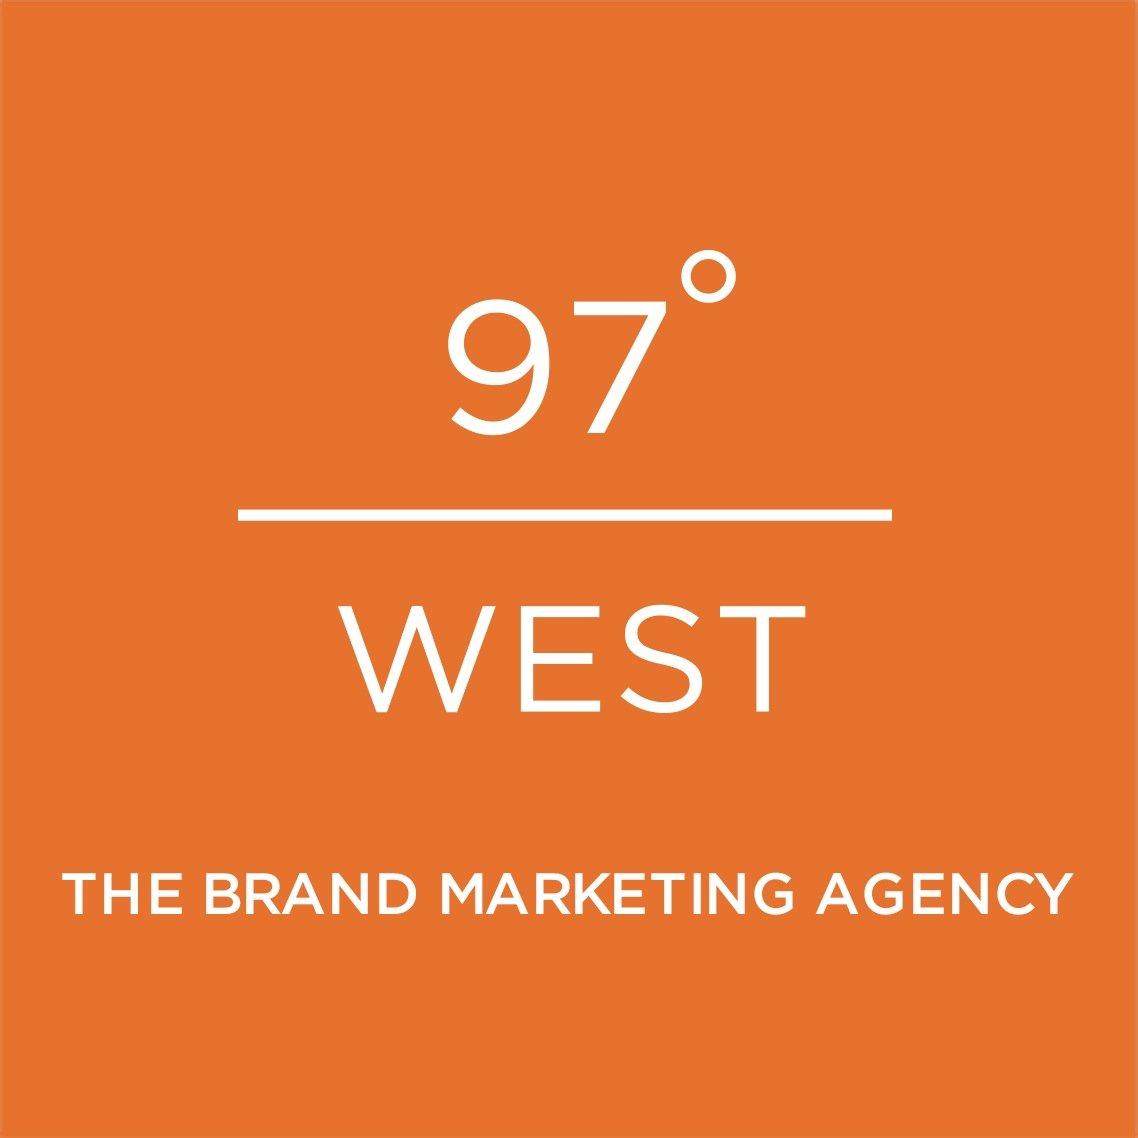 97 Degrees West Logo